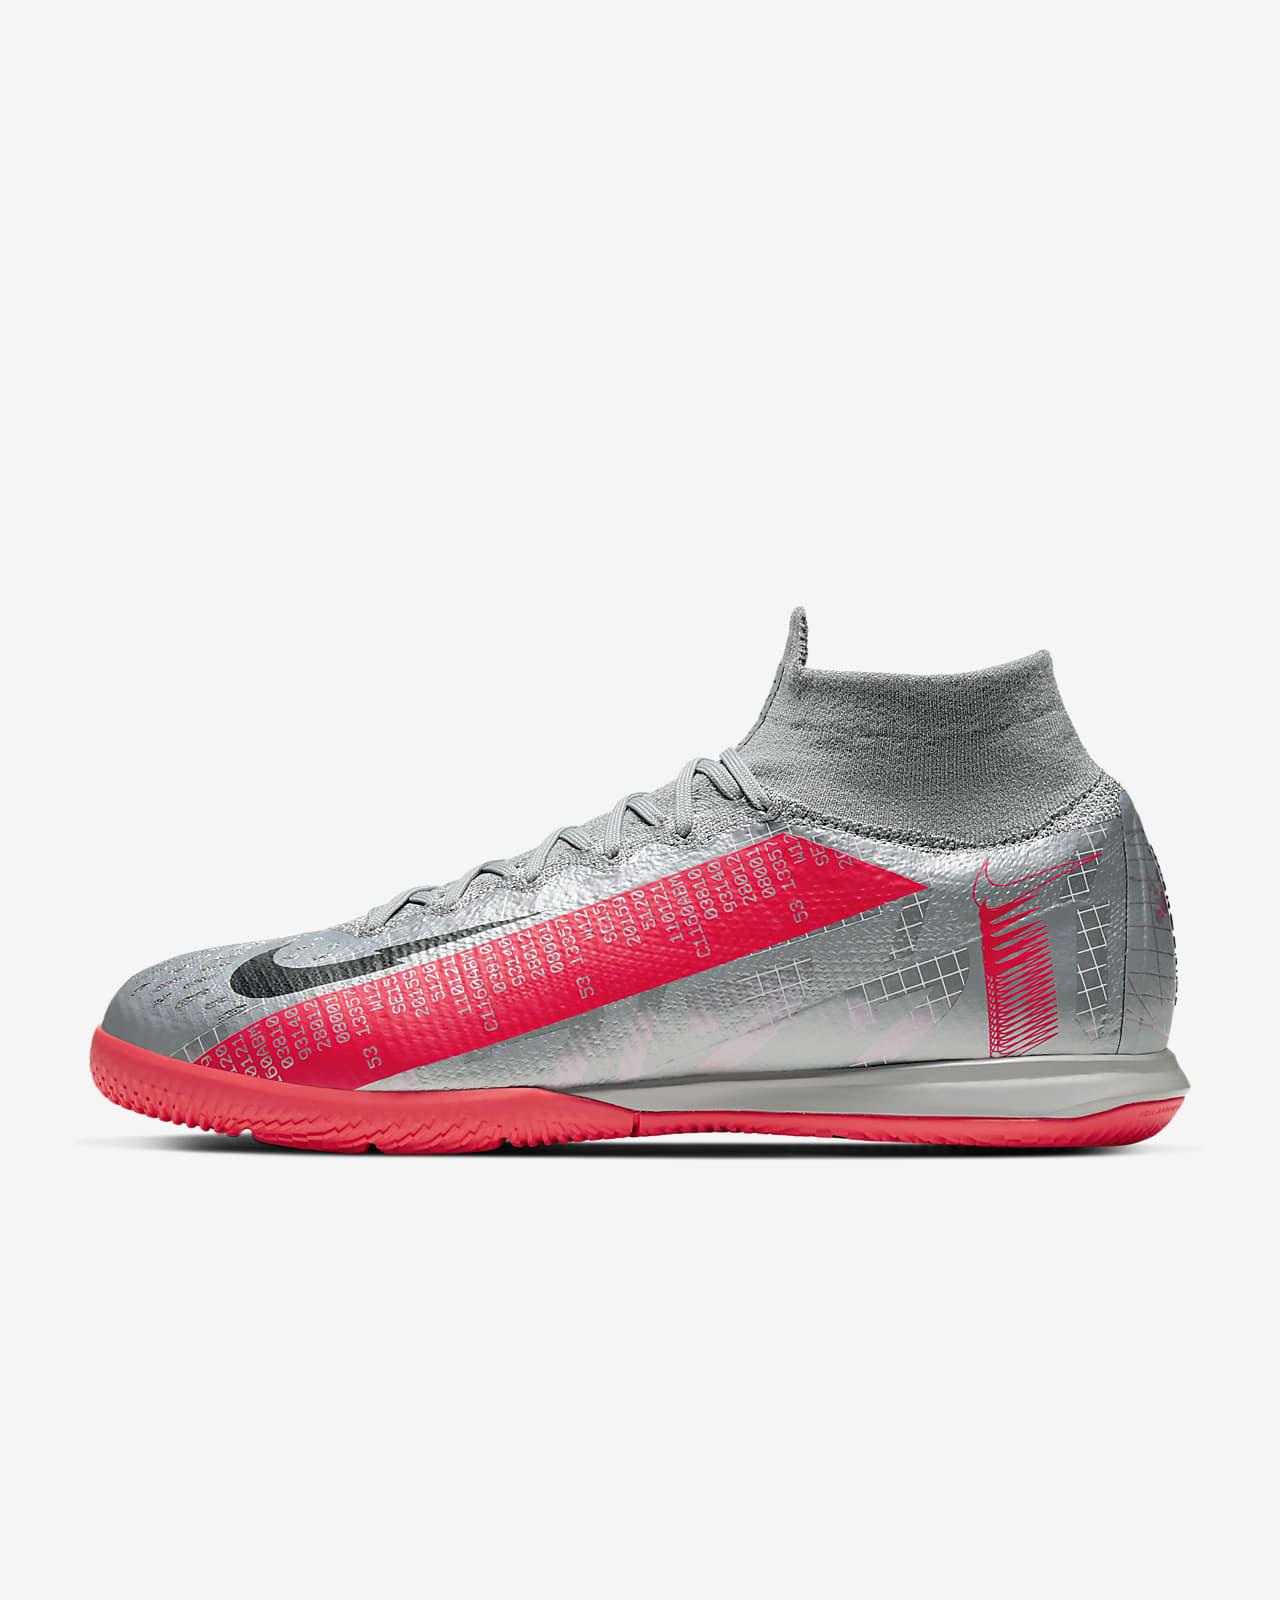 Calzado de fútbol para cancha cubierta Nike Mercurial Superfly 7